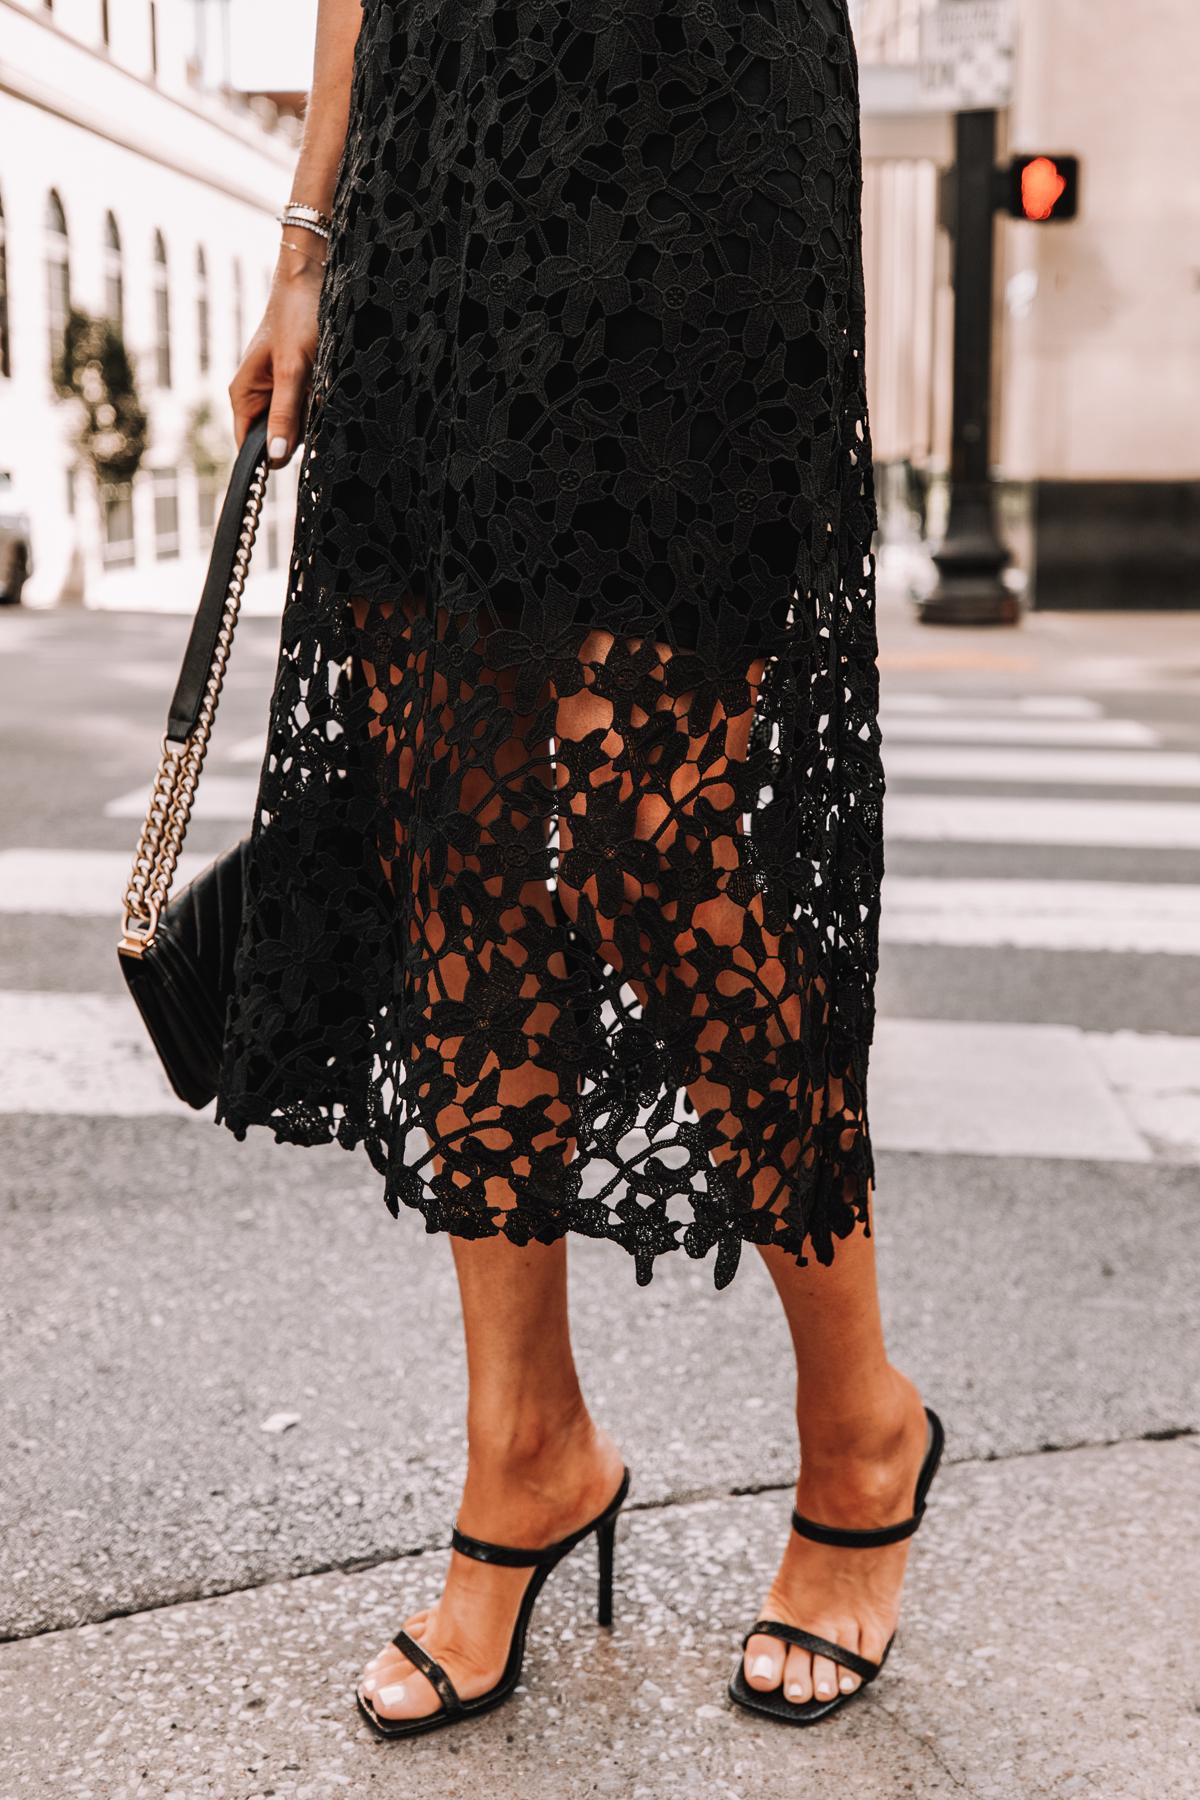 Fashion Jackson Wearing Black Lace Midi Dress Black Heeled Sandals Cocktail Dress